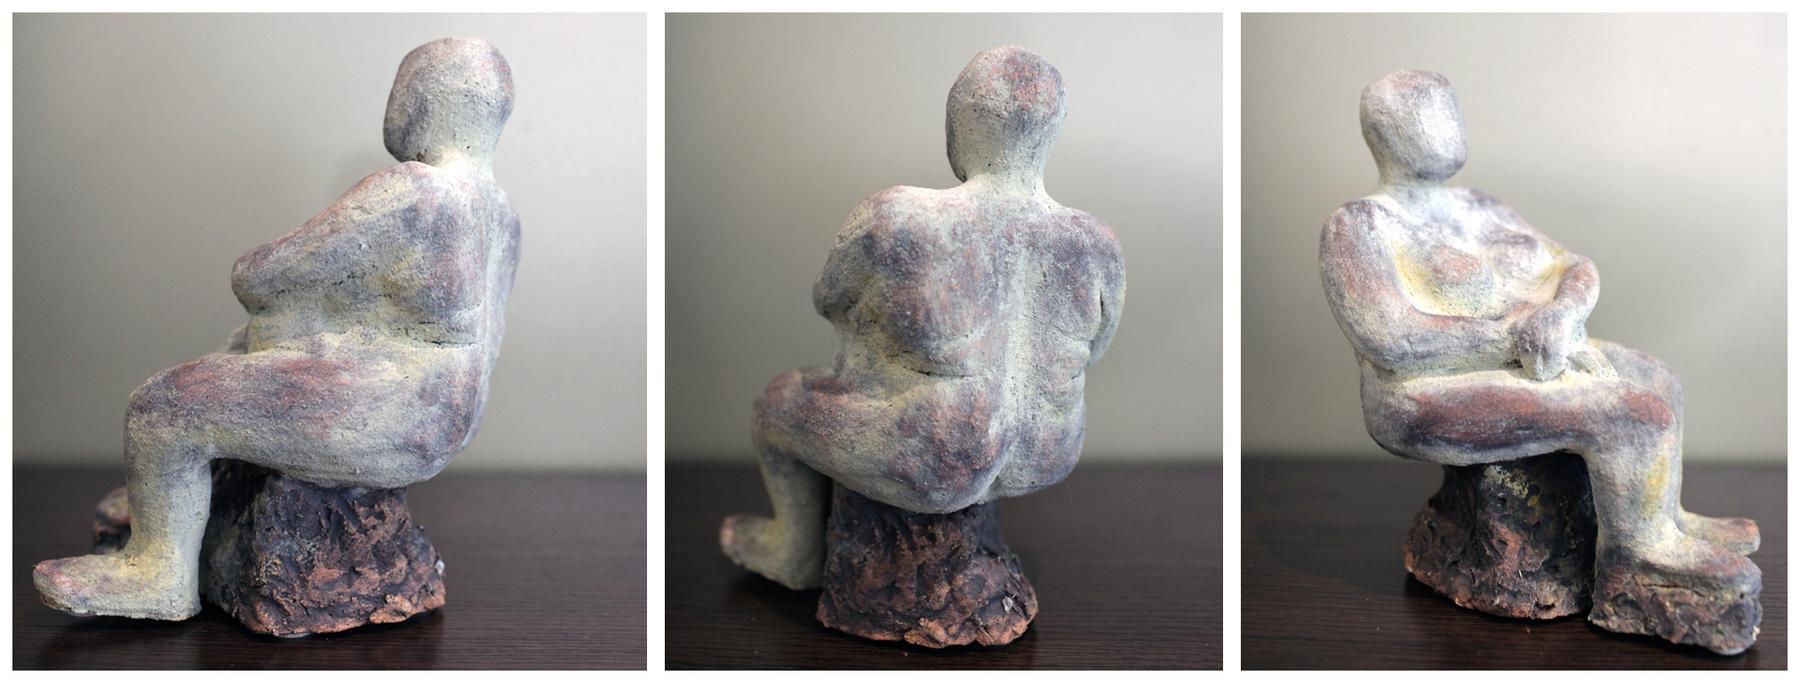 Karen Tabak Artist - Pondering 160w x 200d x 270h. Ceramic clay, fired.